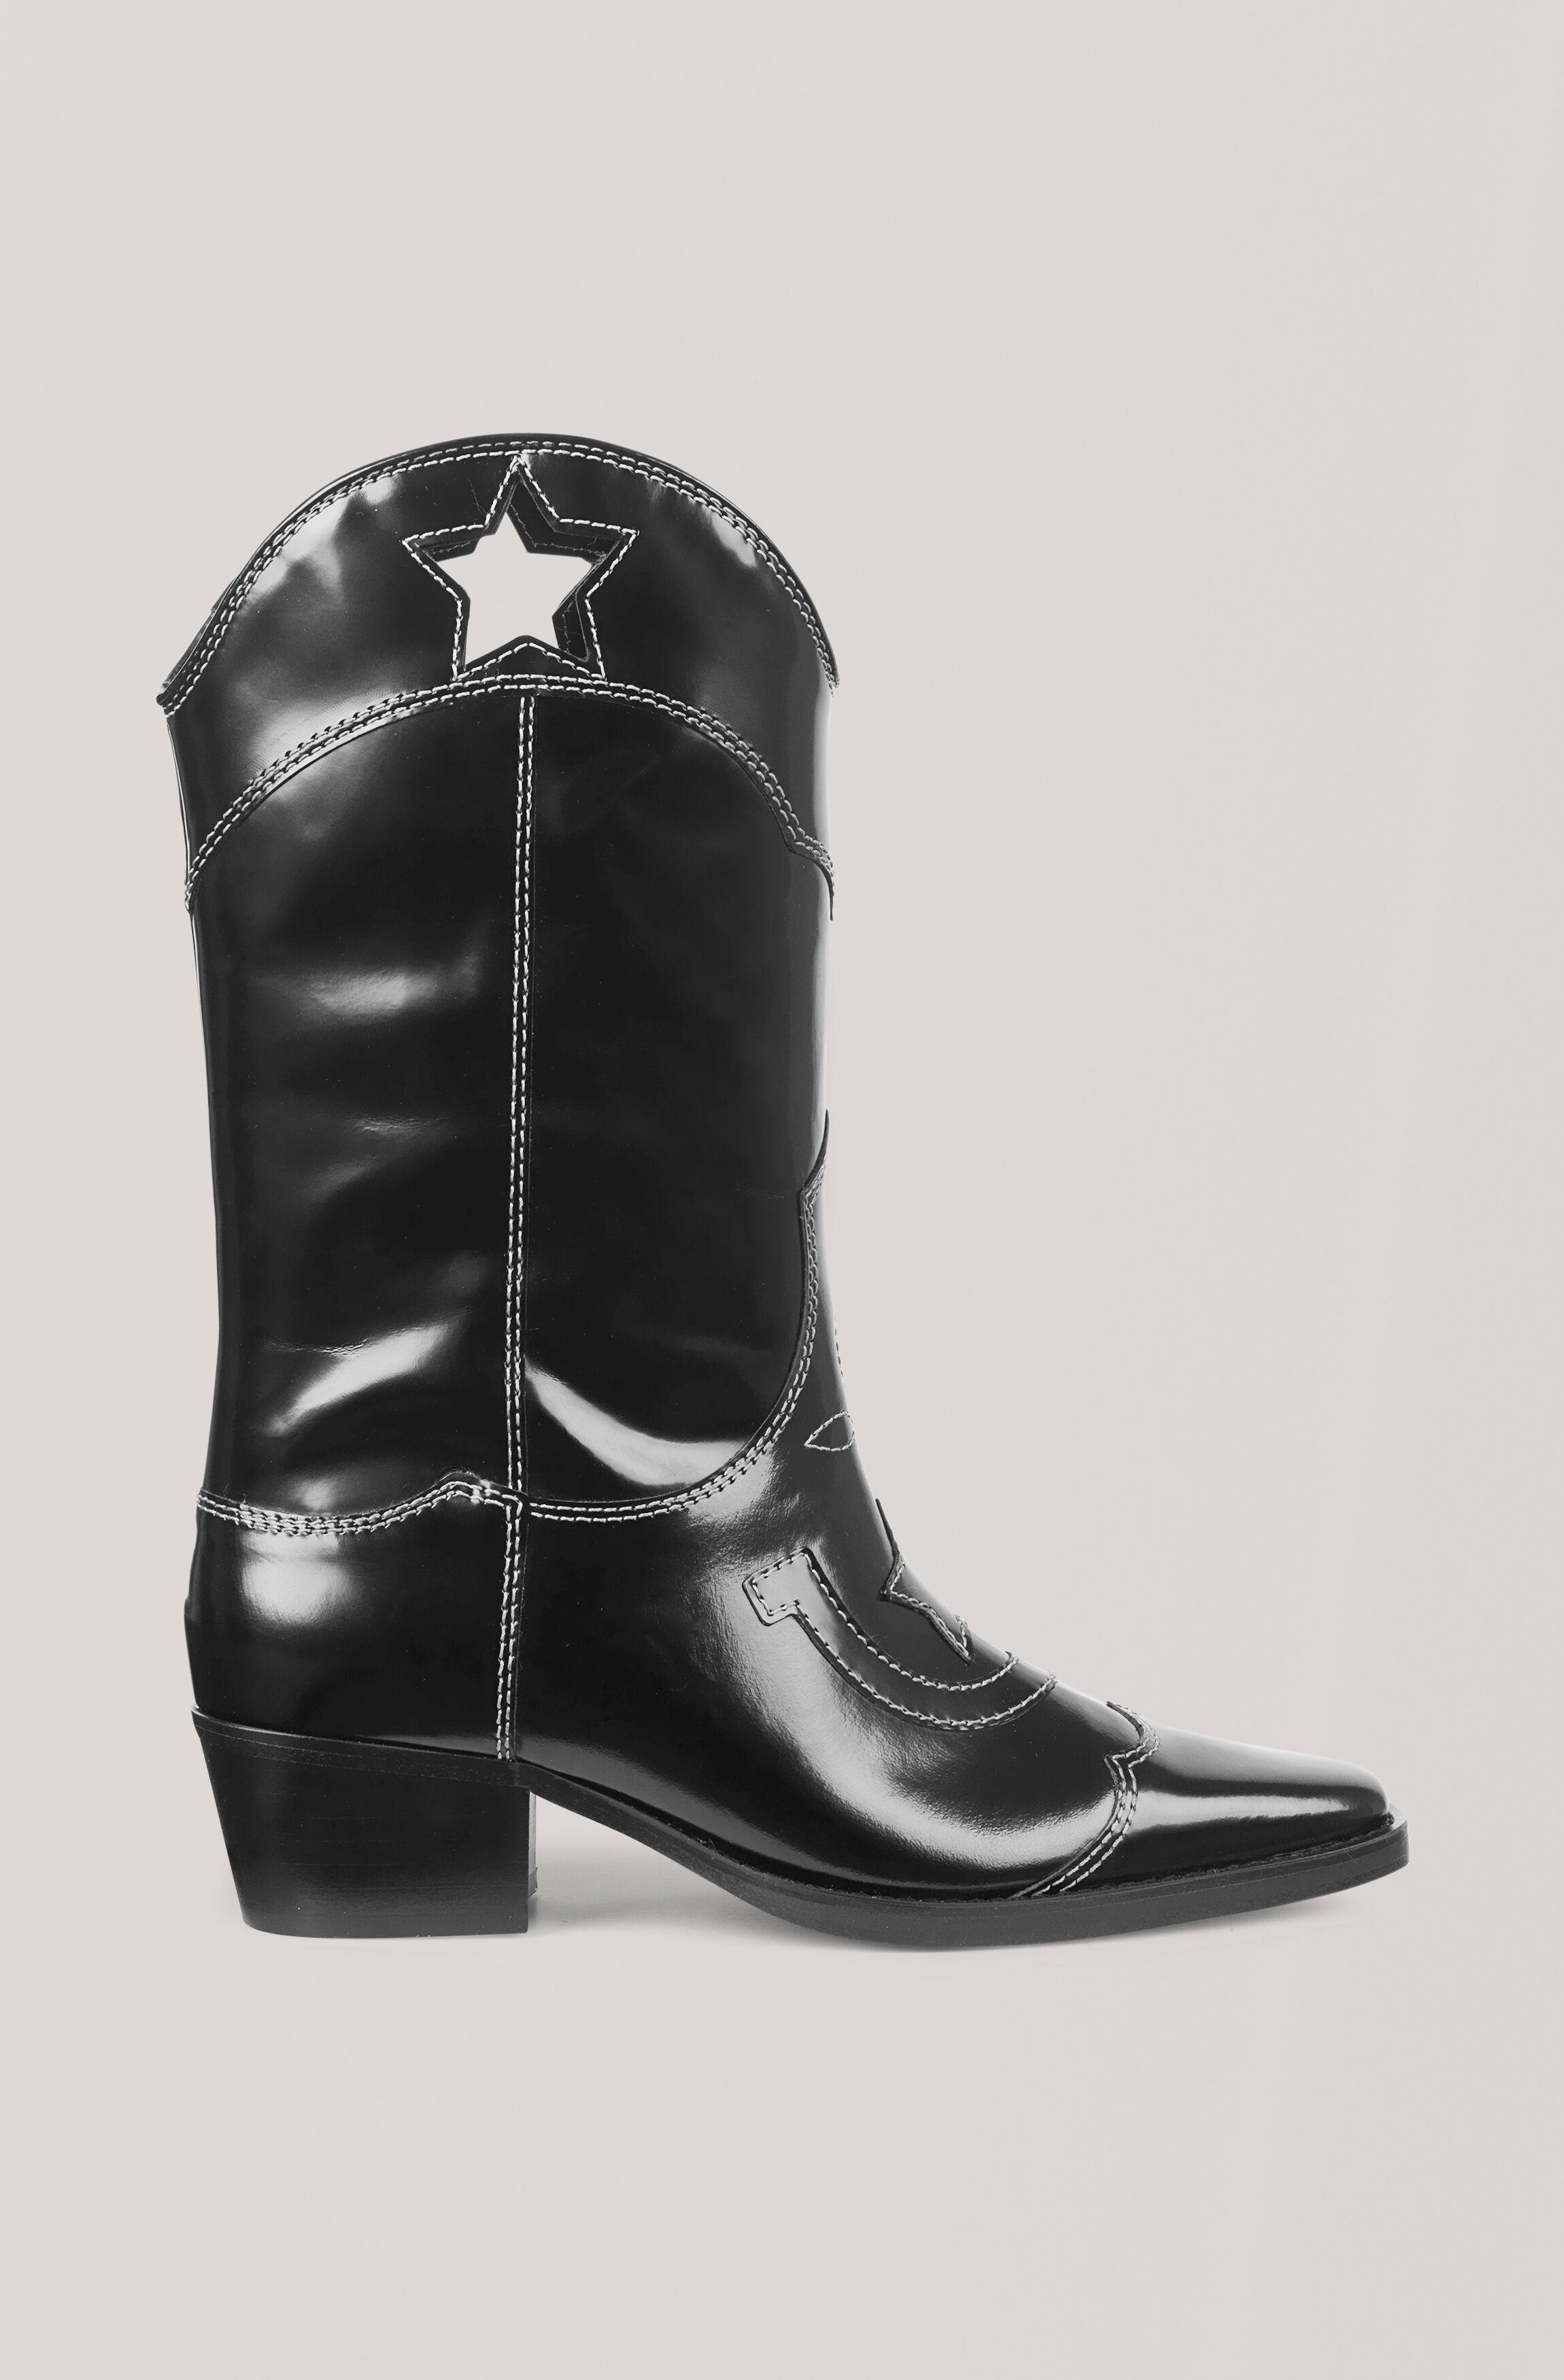 sports shoes 1adc6 6149e Skor GANNI COM Skor GANNI Shoppa på TqqAHd